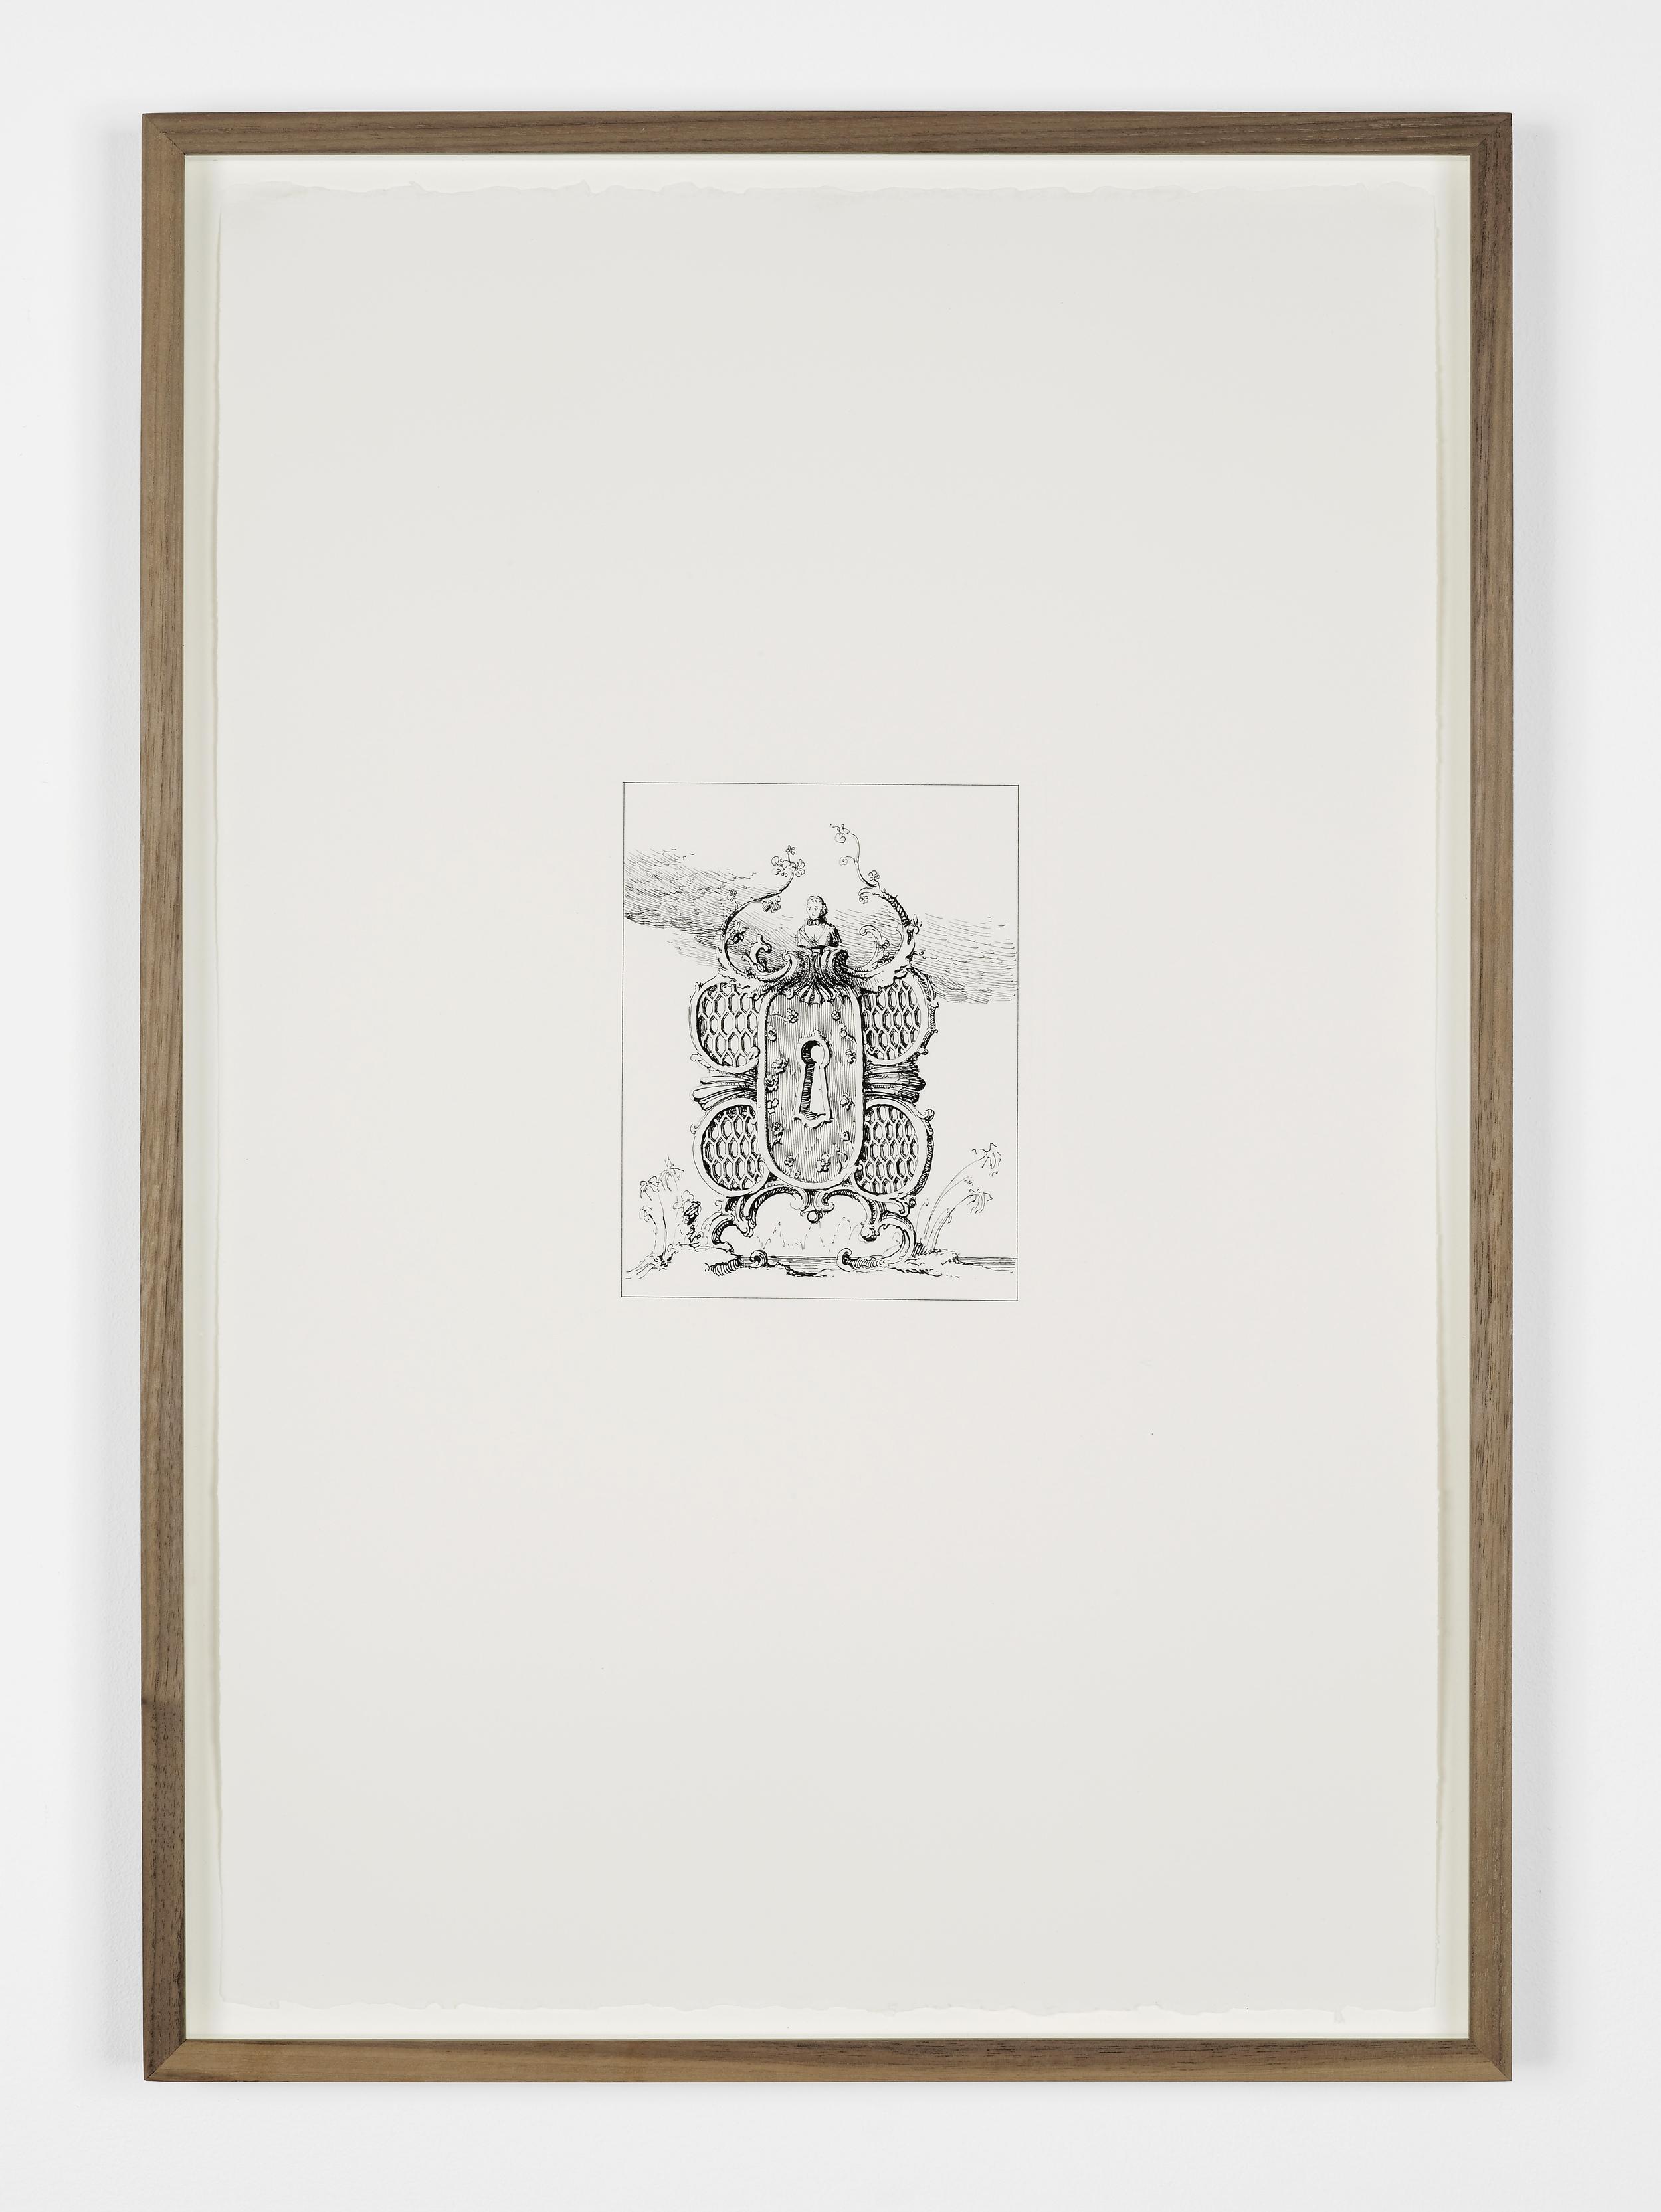 Gilded Keyholes  2013  Ink on paper  61.7 x 47 cm / 24.2 x 18.5 in framed